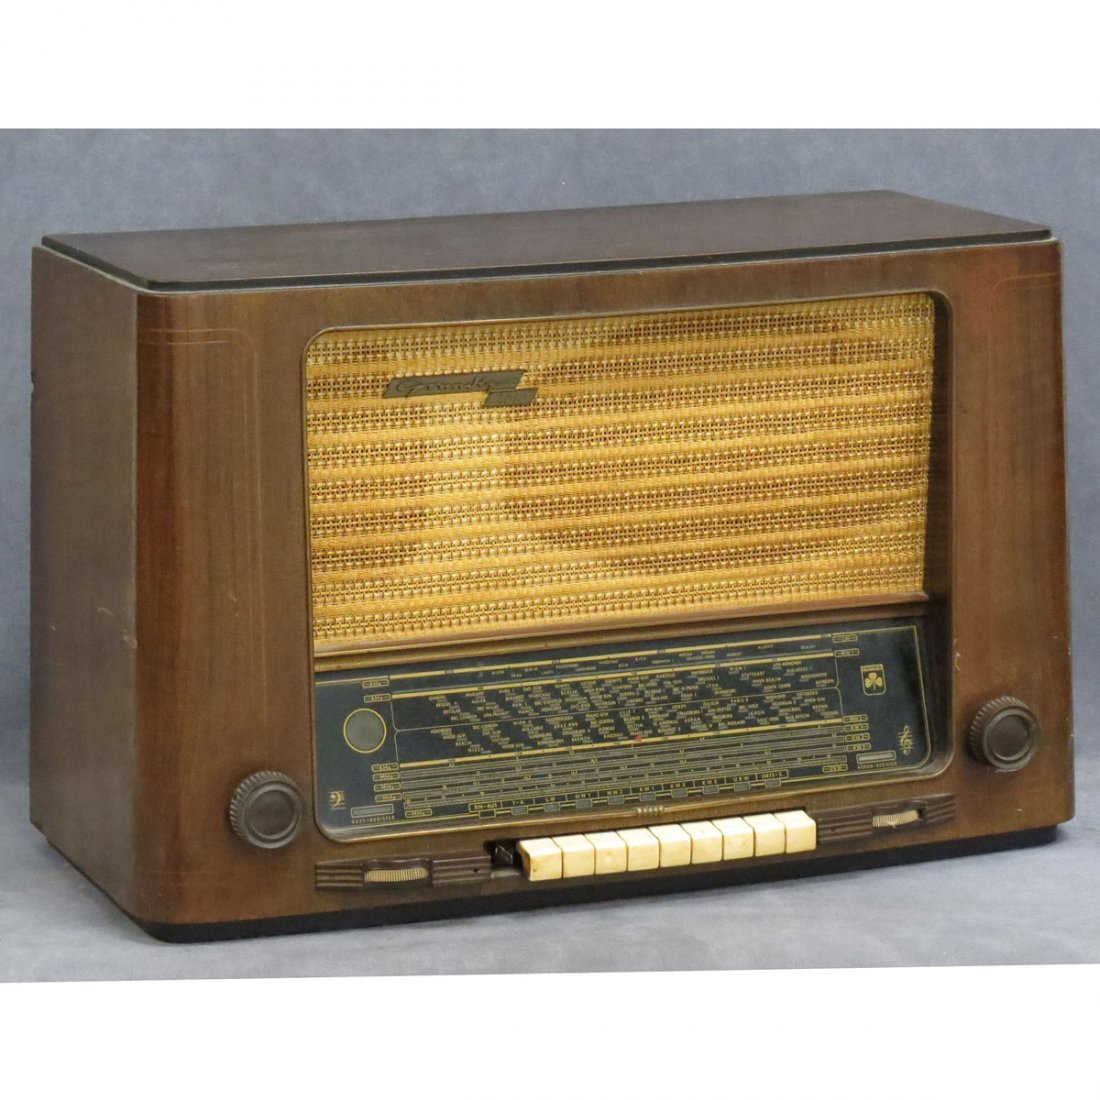 GRUNDIG MODEL #1010GW MULTI-BAND RADIO